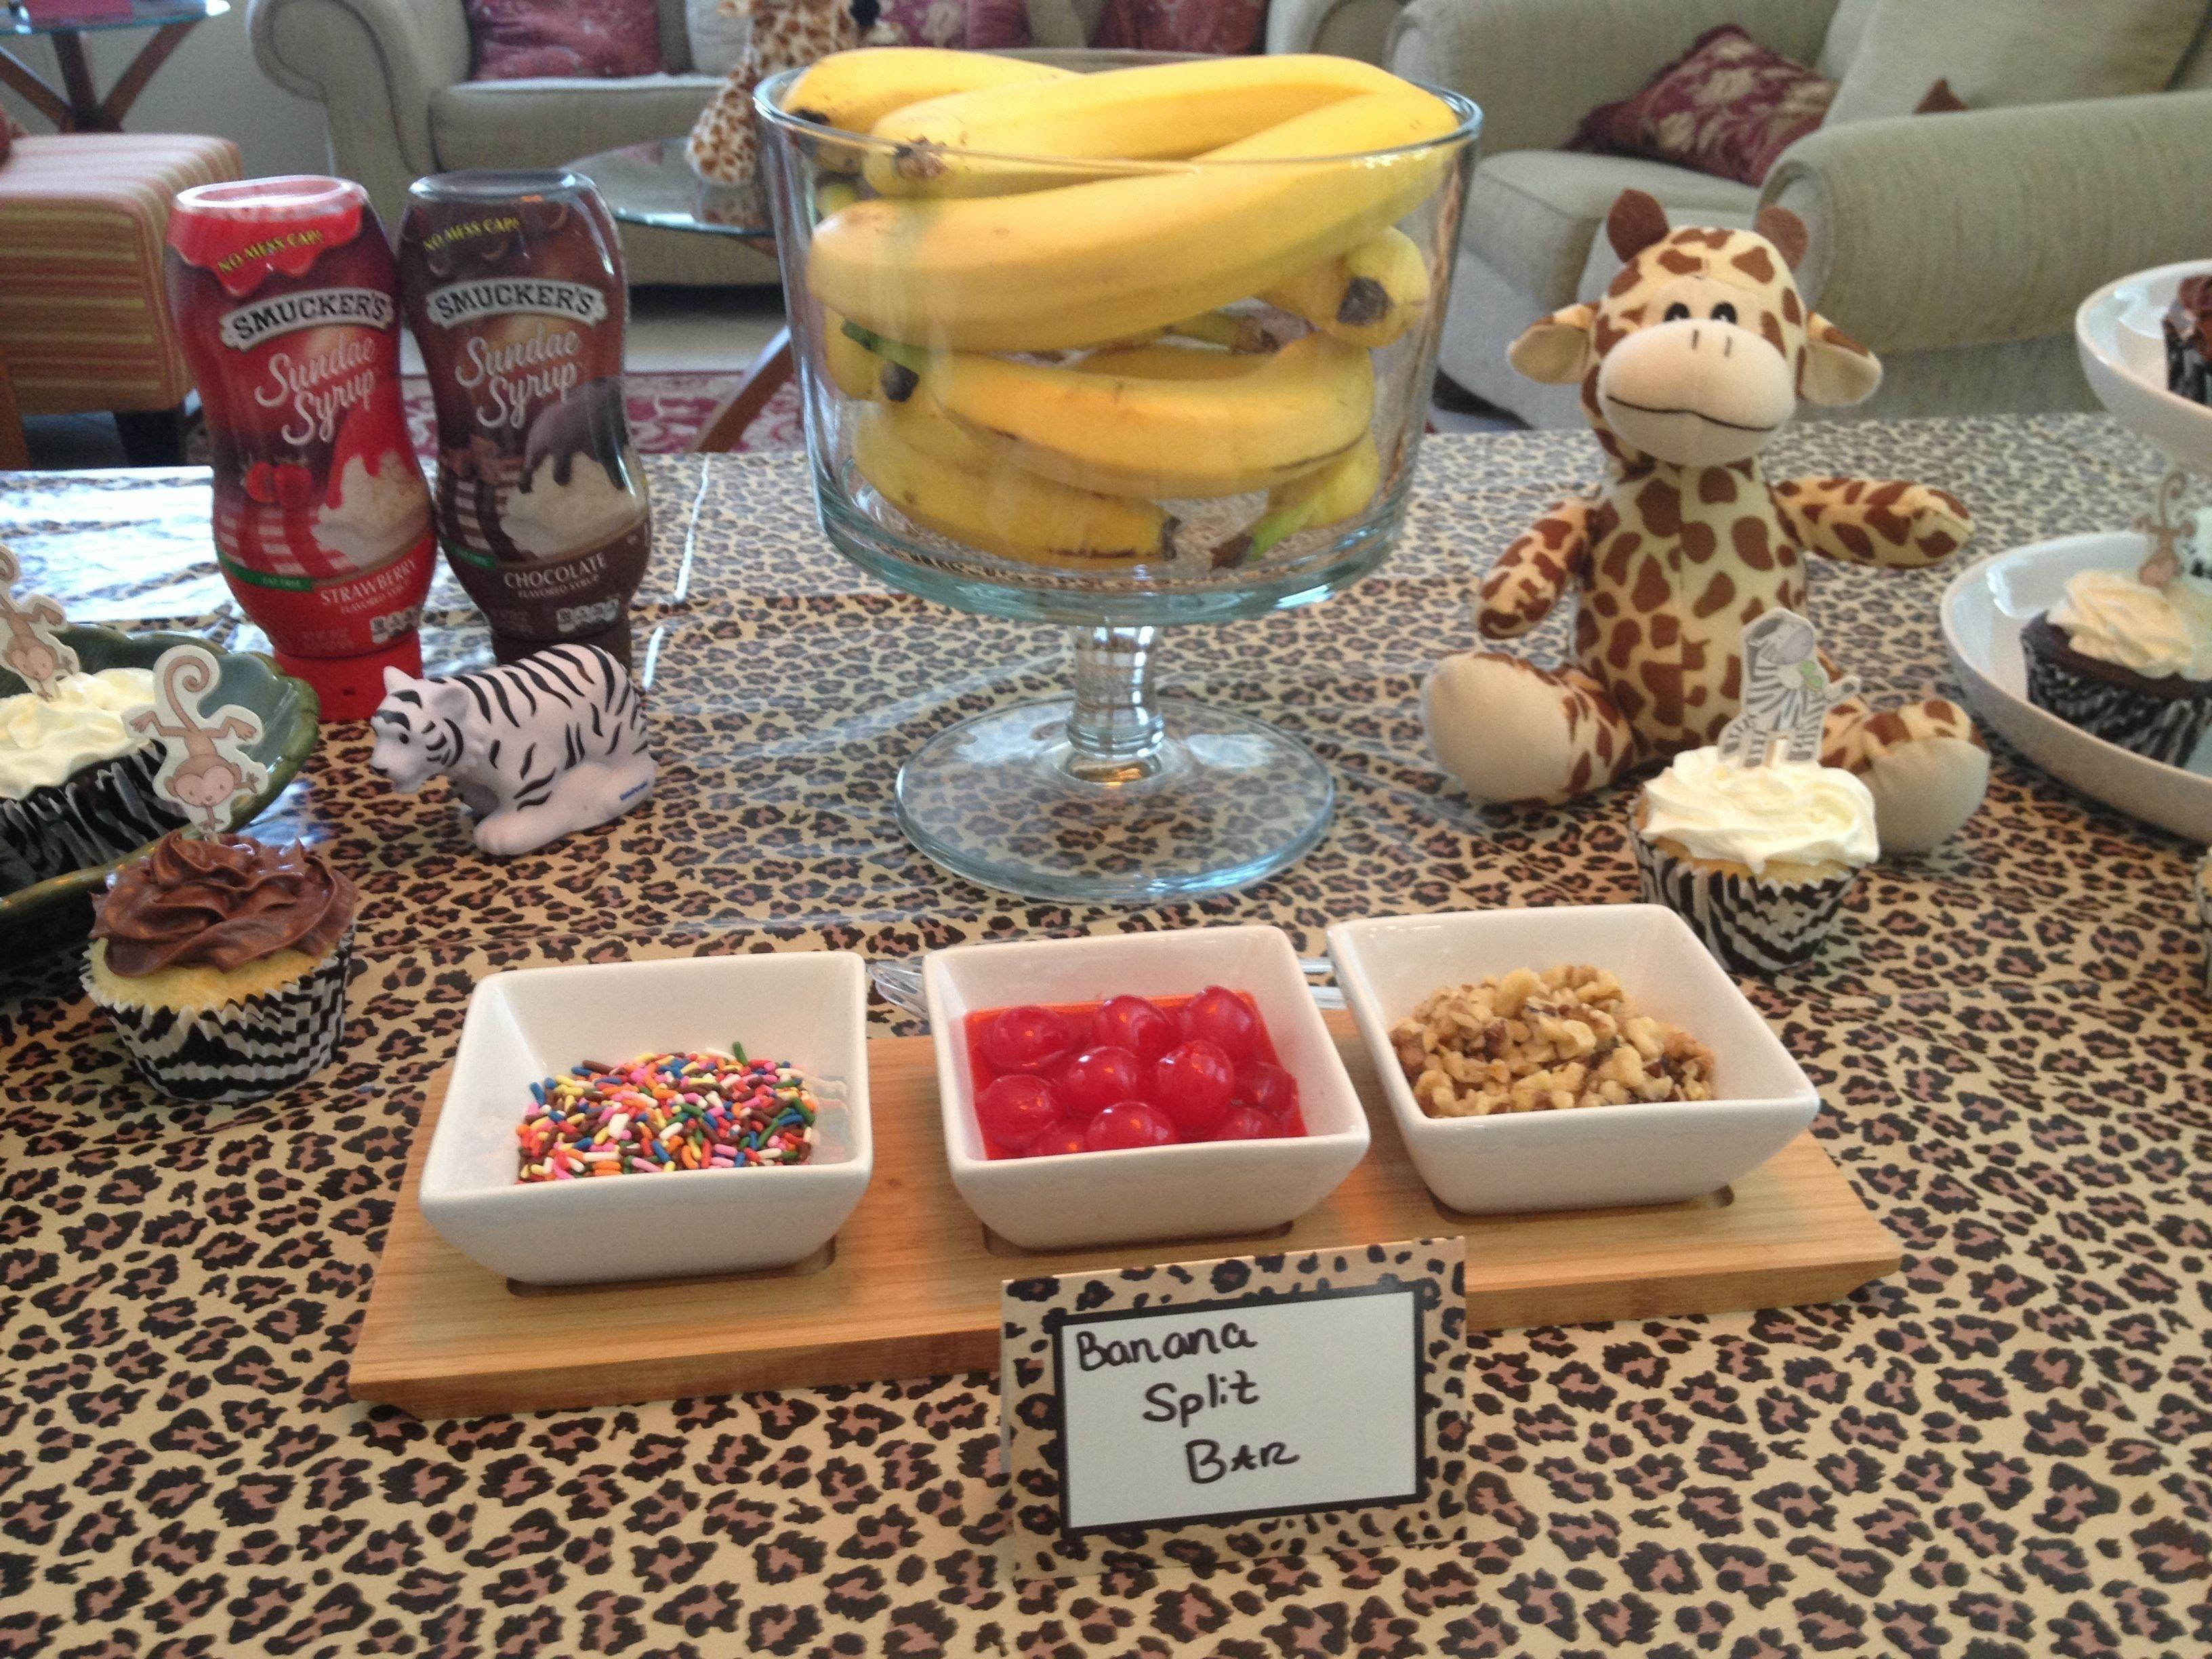 10 Best Jungle Baby Shower Food Ideas banana split bar at jungle baby shower my pinterest projects 2020